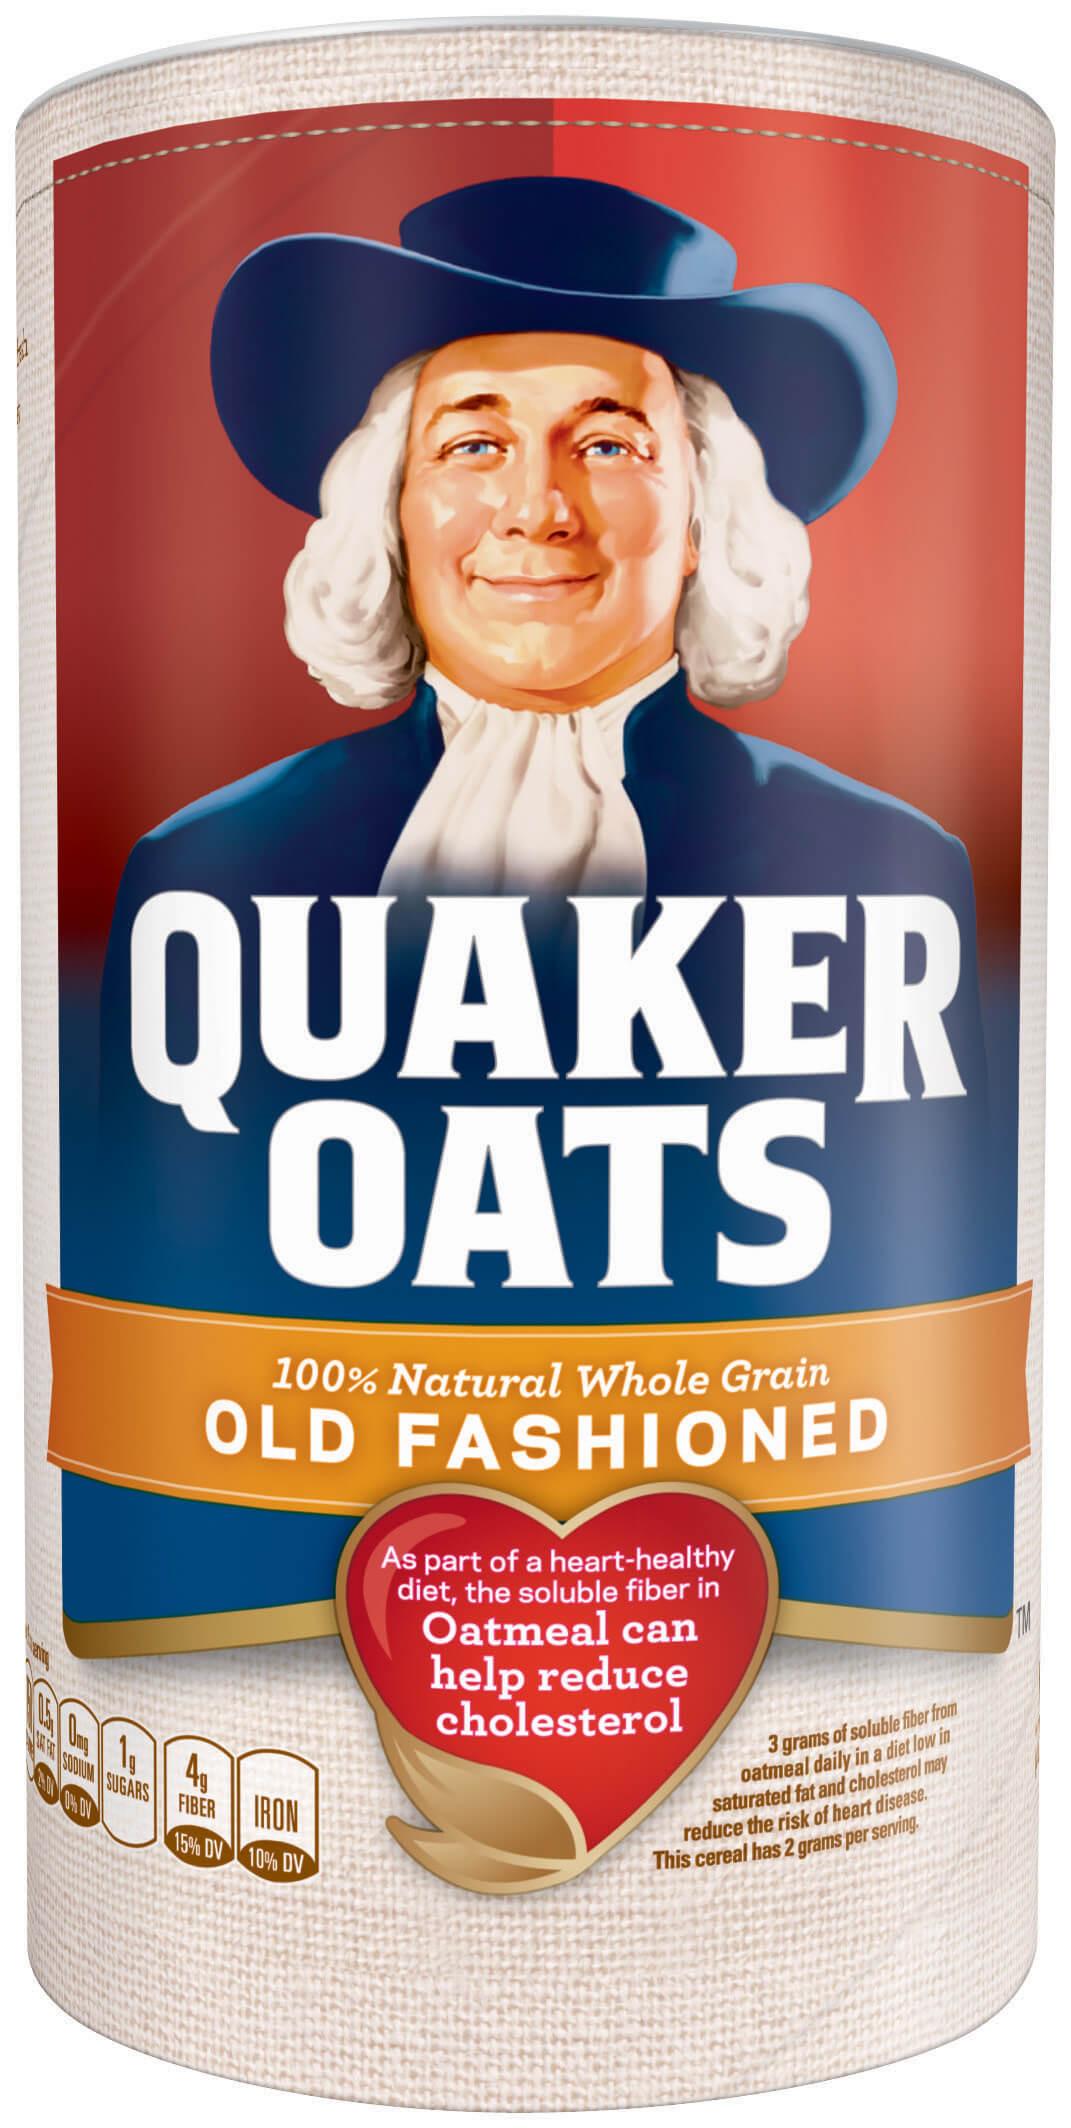 Are Quaker Old Fashioned Oats Gluten Free  Product Hot Cereals Old Fashioned Quaker Oats